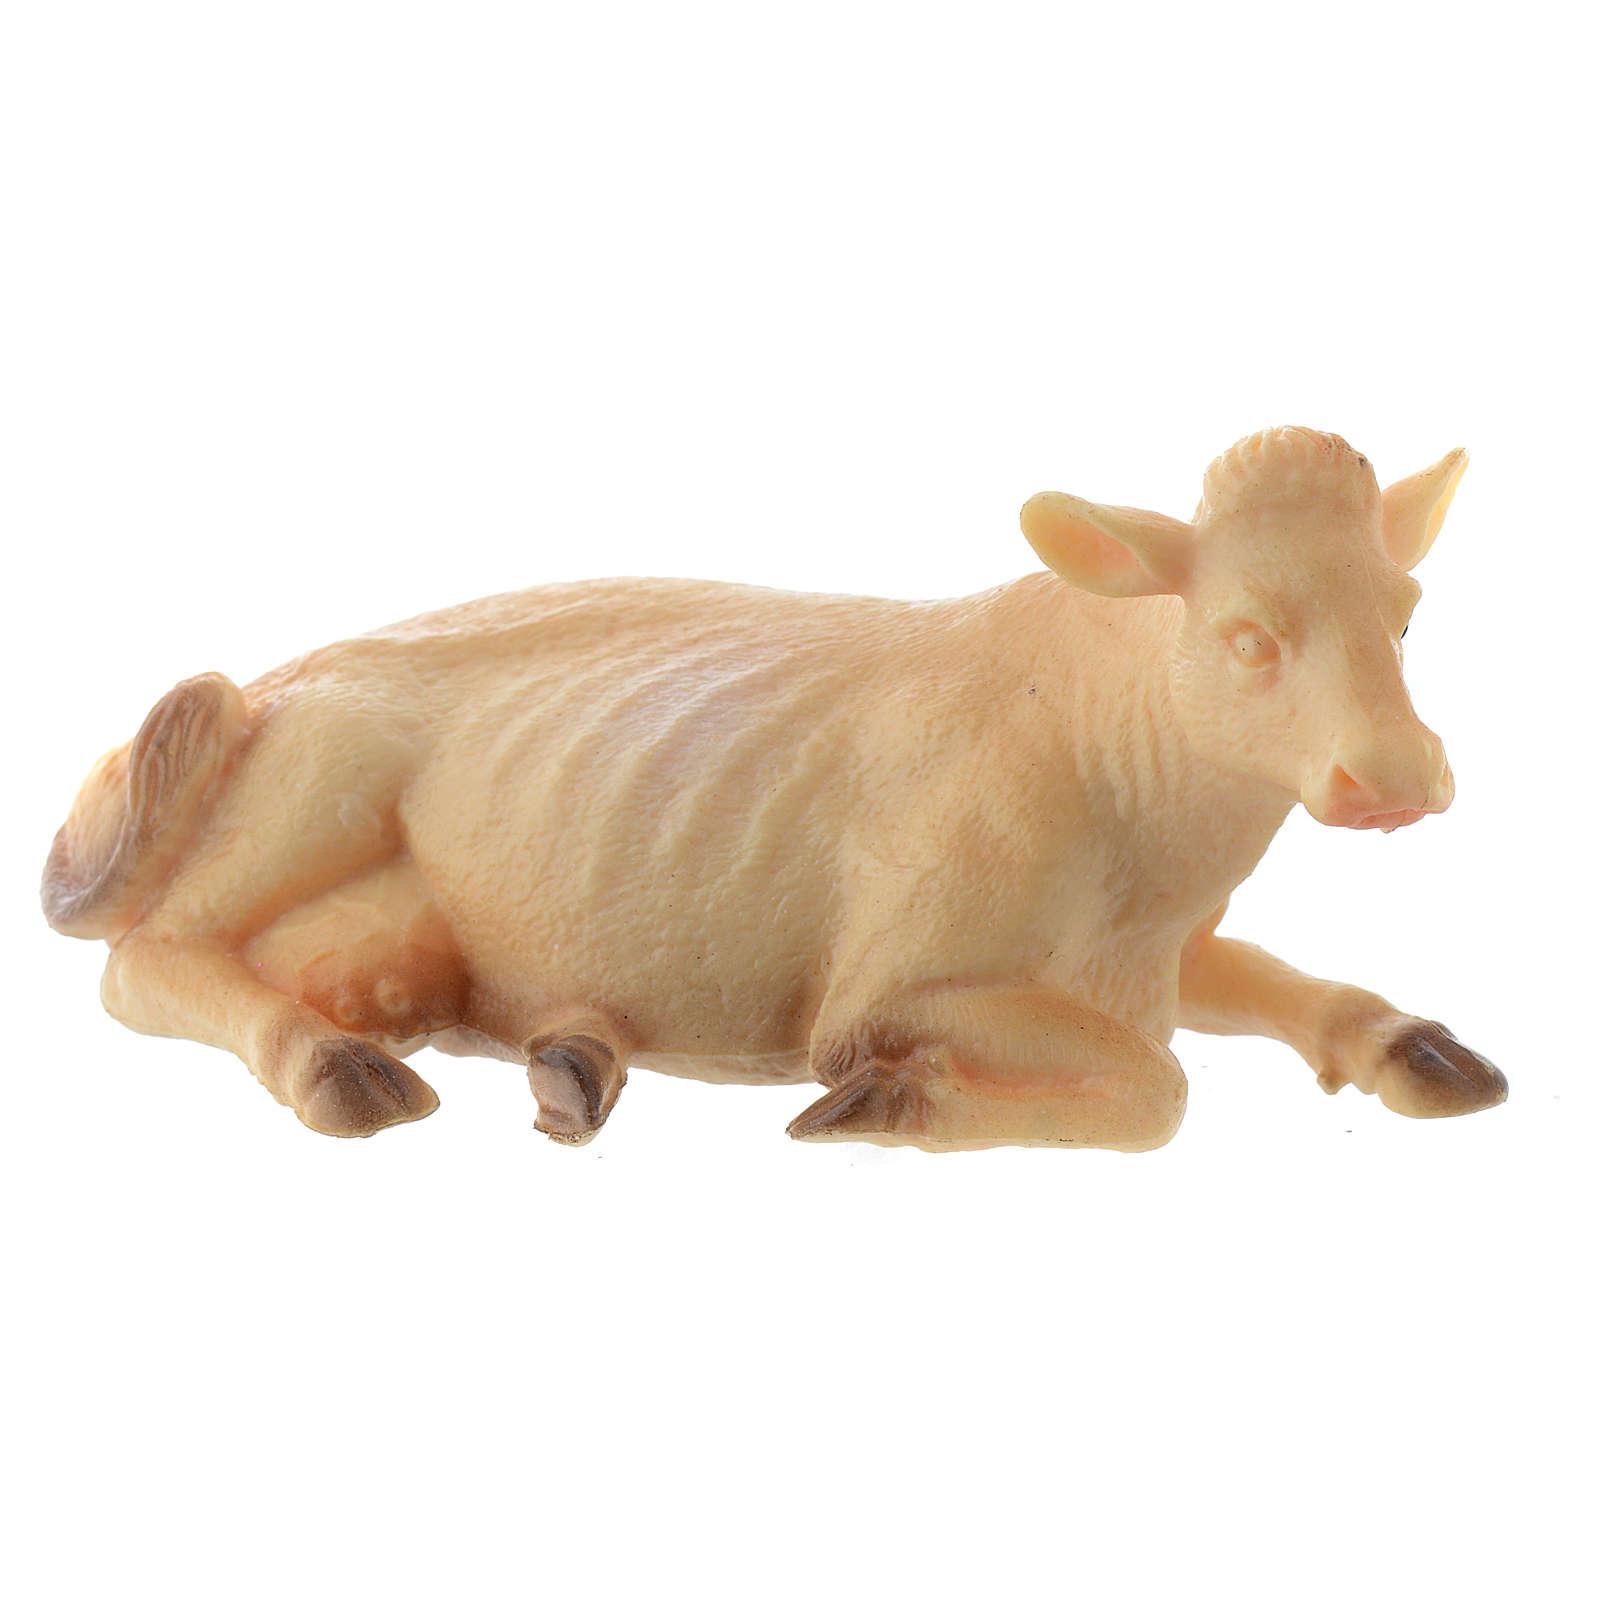 Vaca resina 7 cm. altura 3